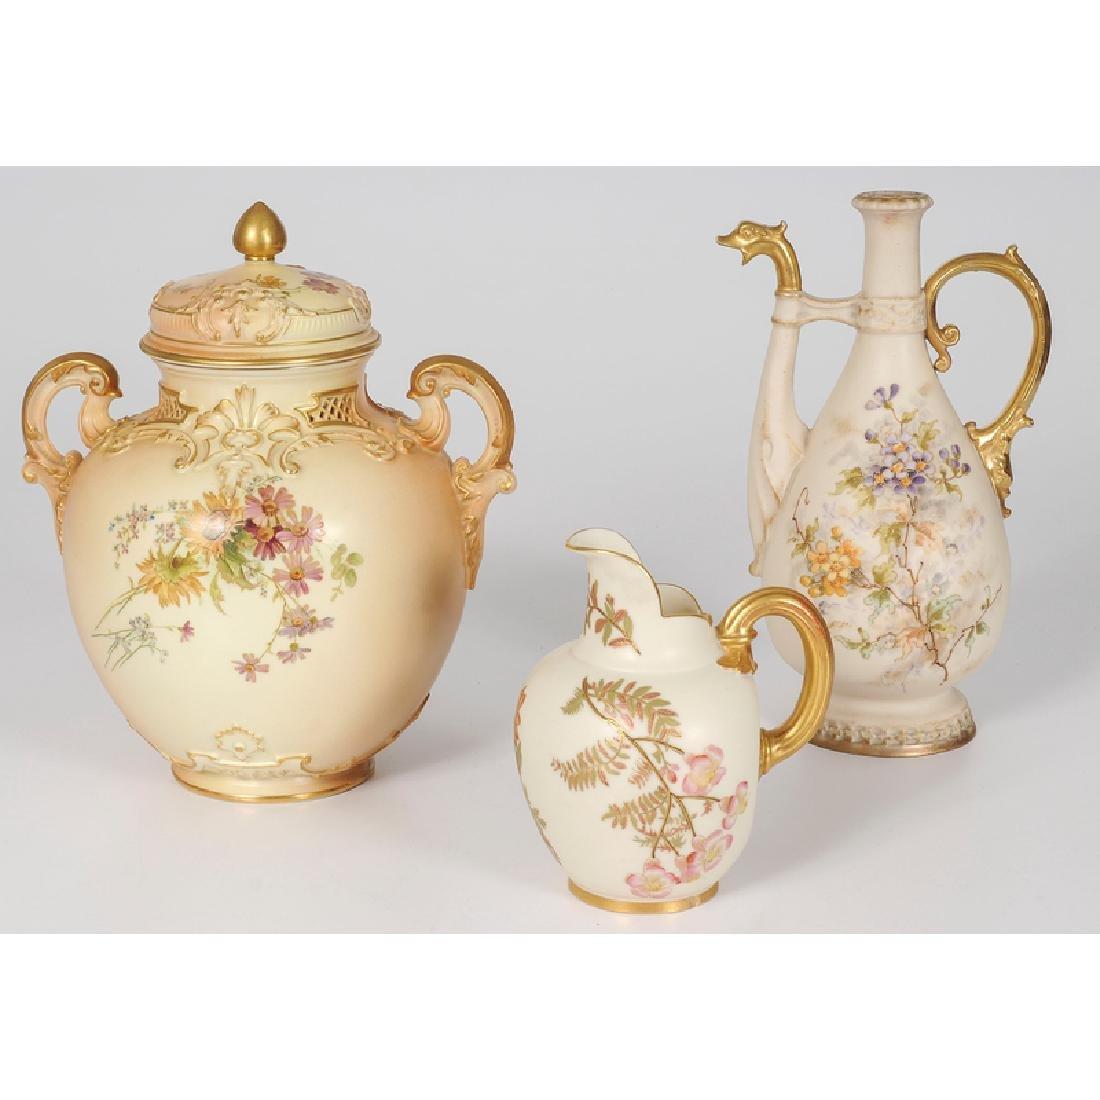 Royal Worcester Lidded Jar and Creamer and Teplitz - 2